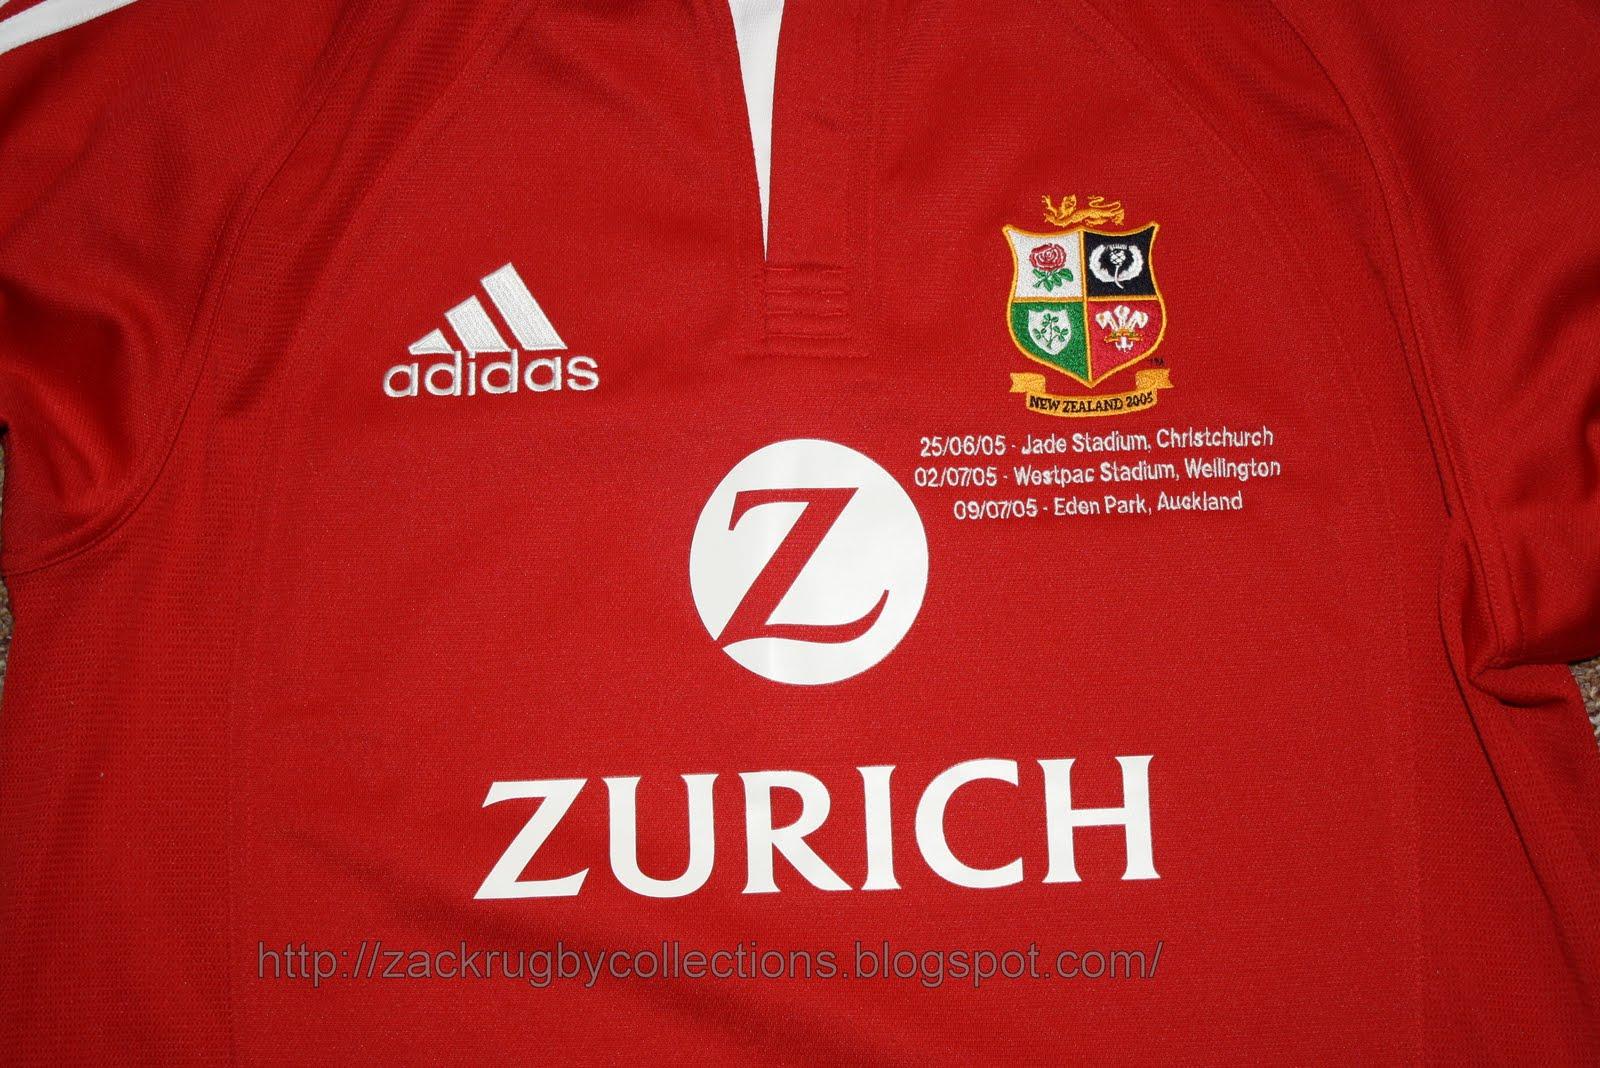 Chùm ảnh: Zurich jersey (9)